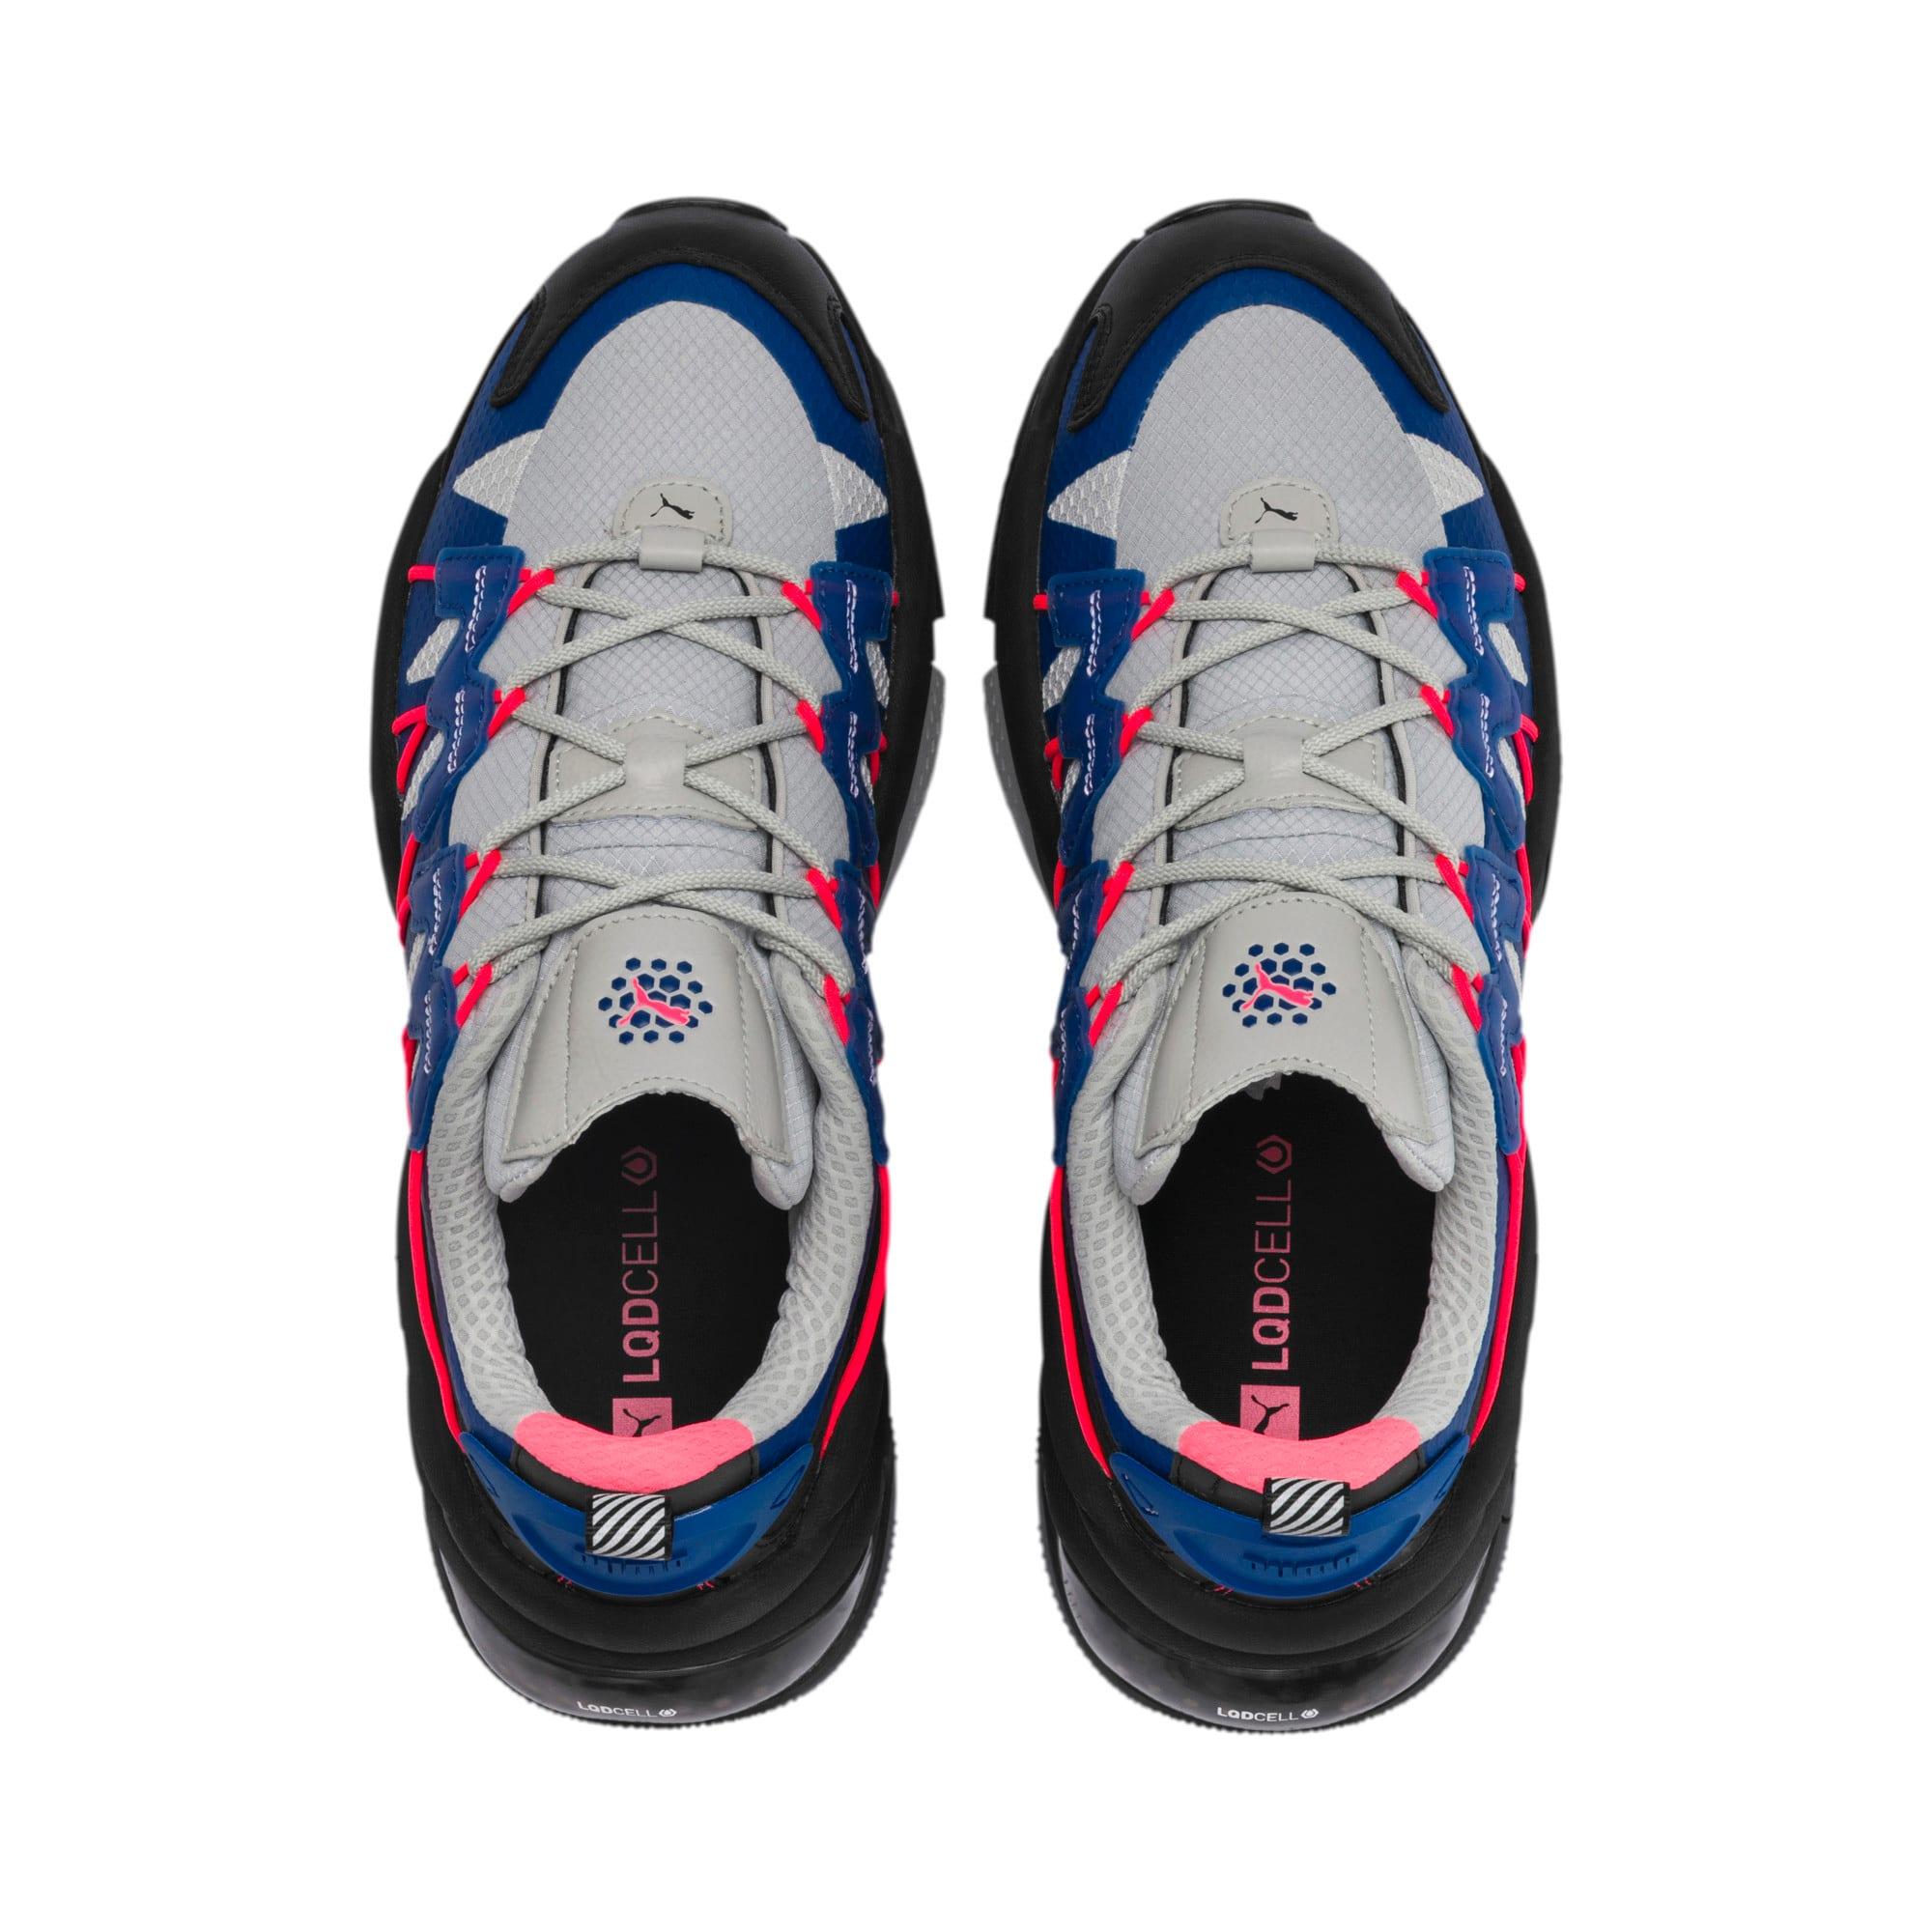 Thumbnail 6 of LQDCELL Omega Lab Sneaker, Puma Black-Galaxy Blue, medium